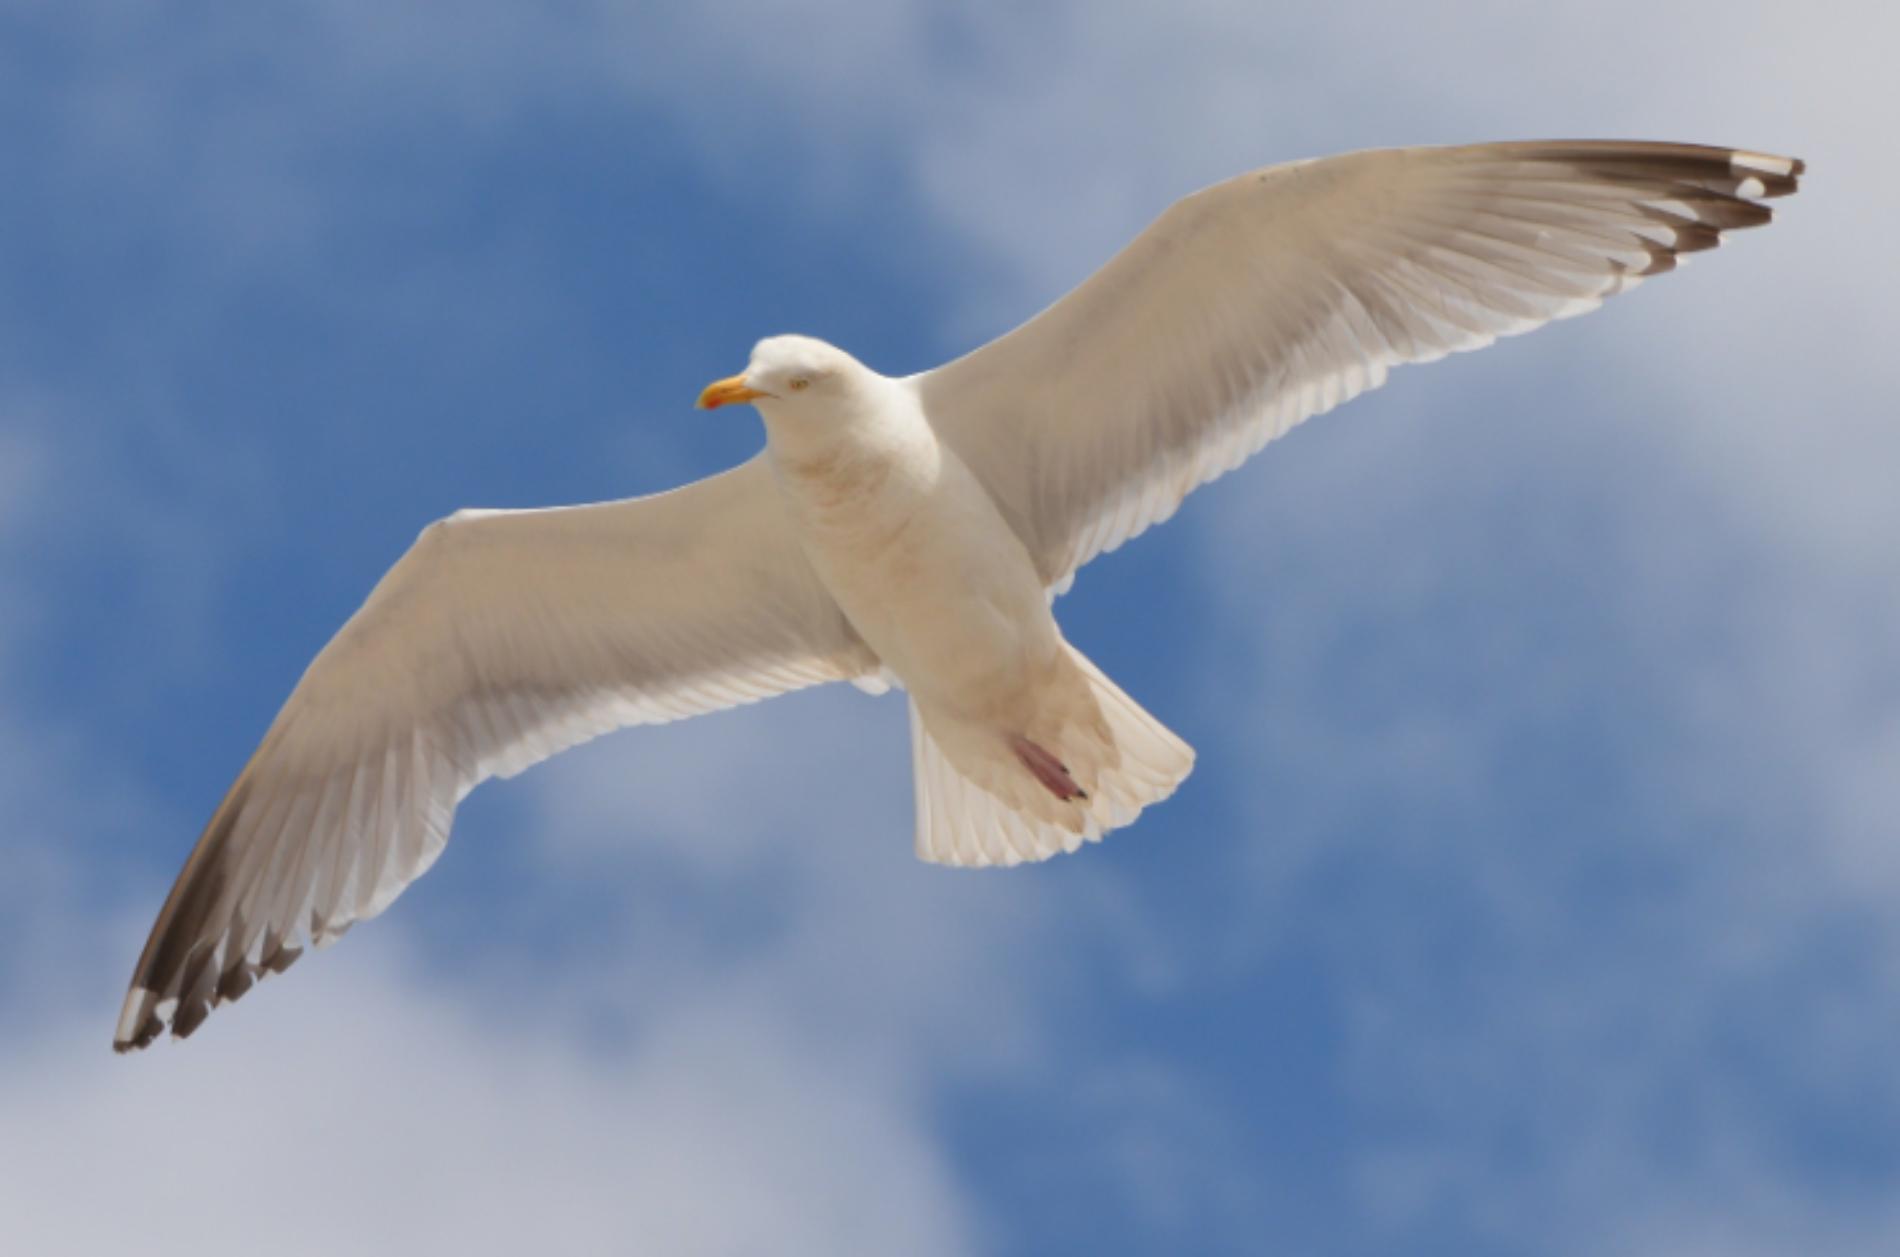 The Floating Bird-Like Robot